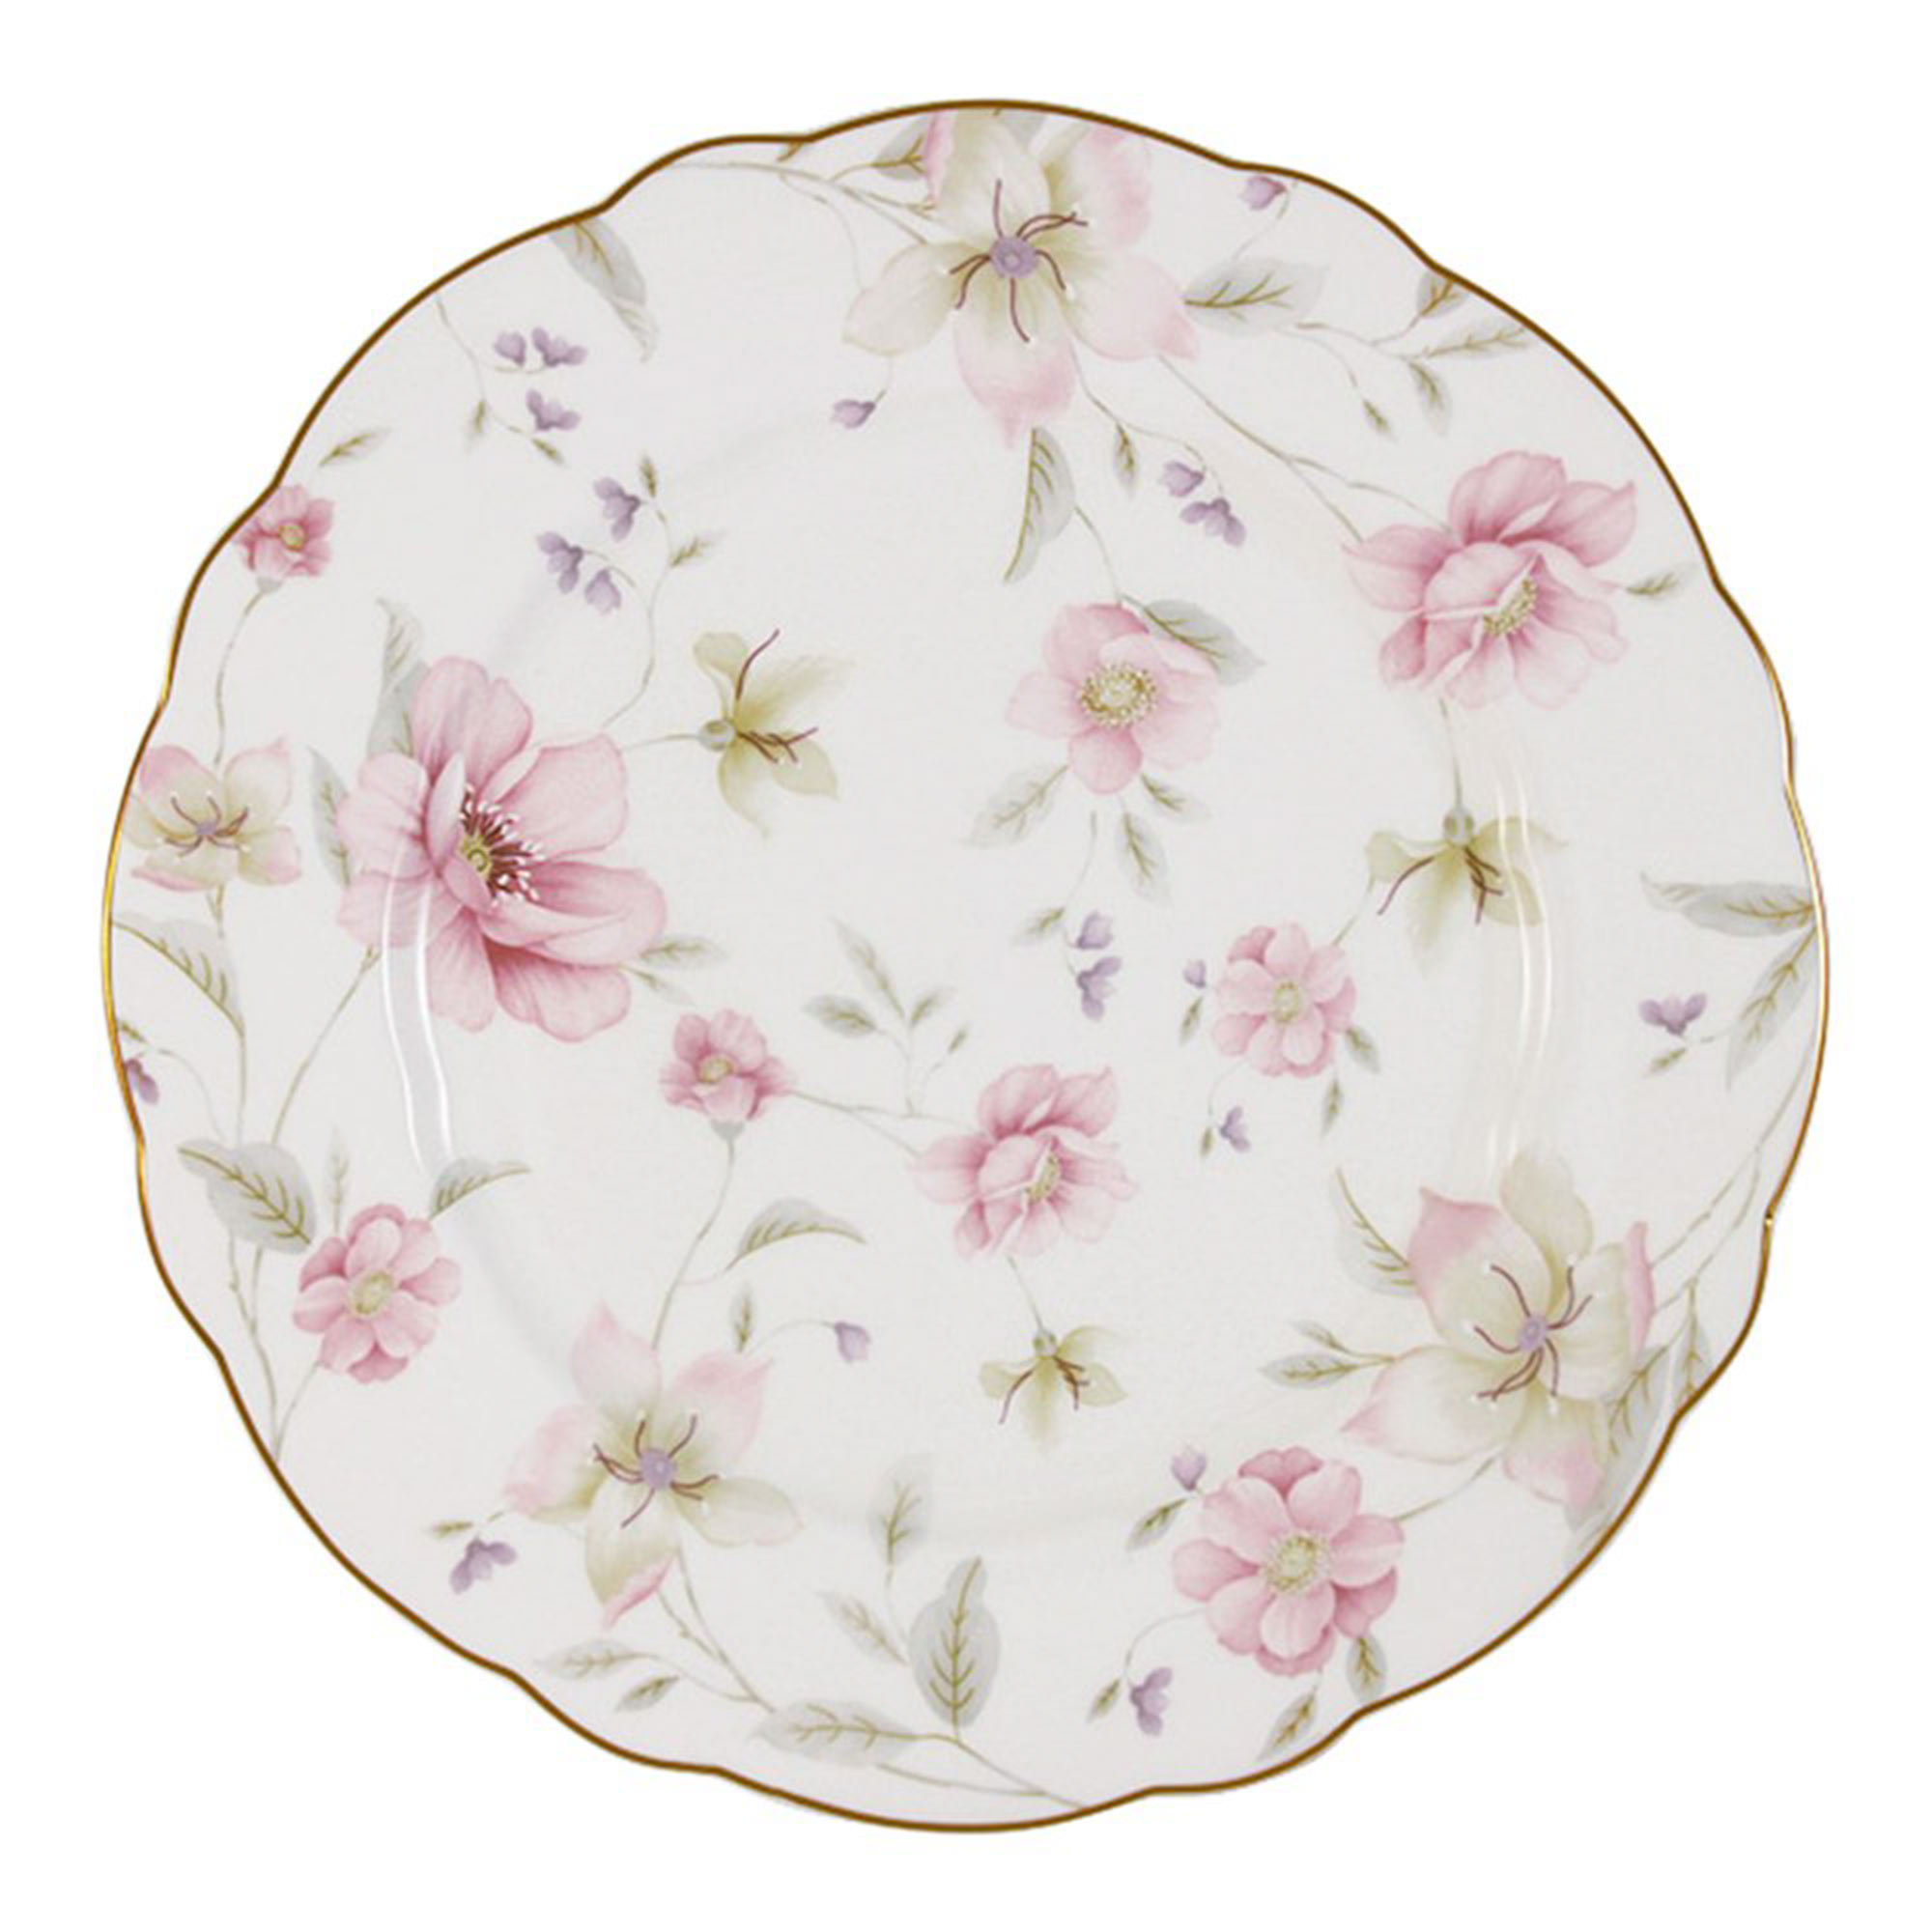 Тарелка обеденная Anna Lafarg Розовый танец 26,5 см тарелка закусочная anna lafarg emily kamelia 19 см